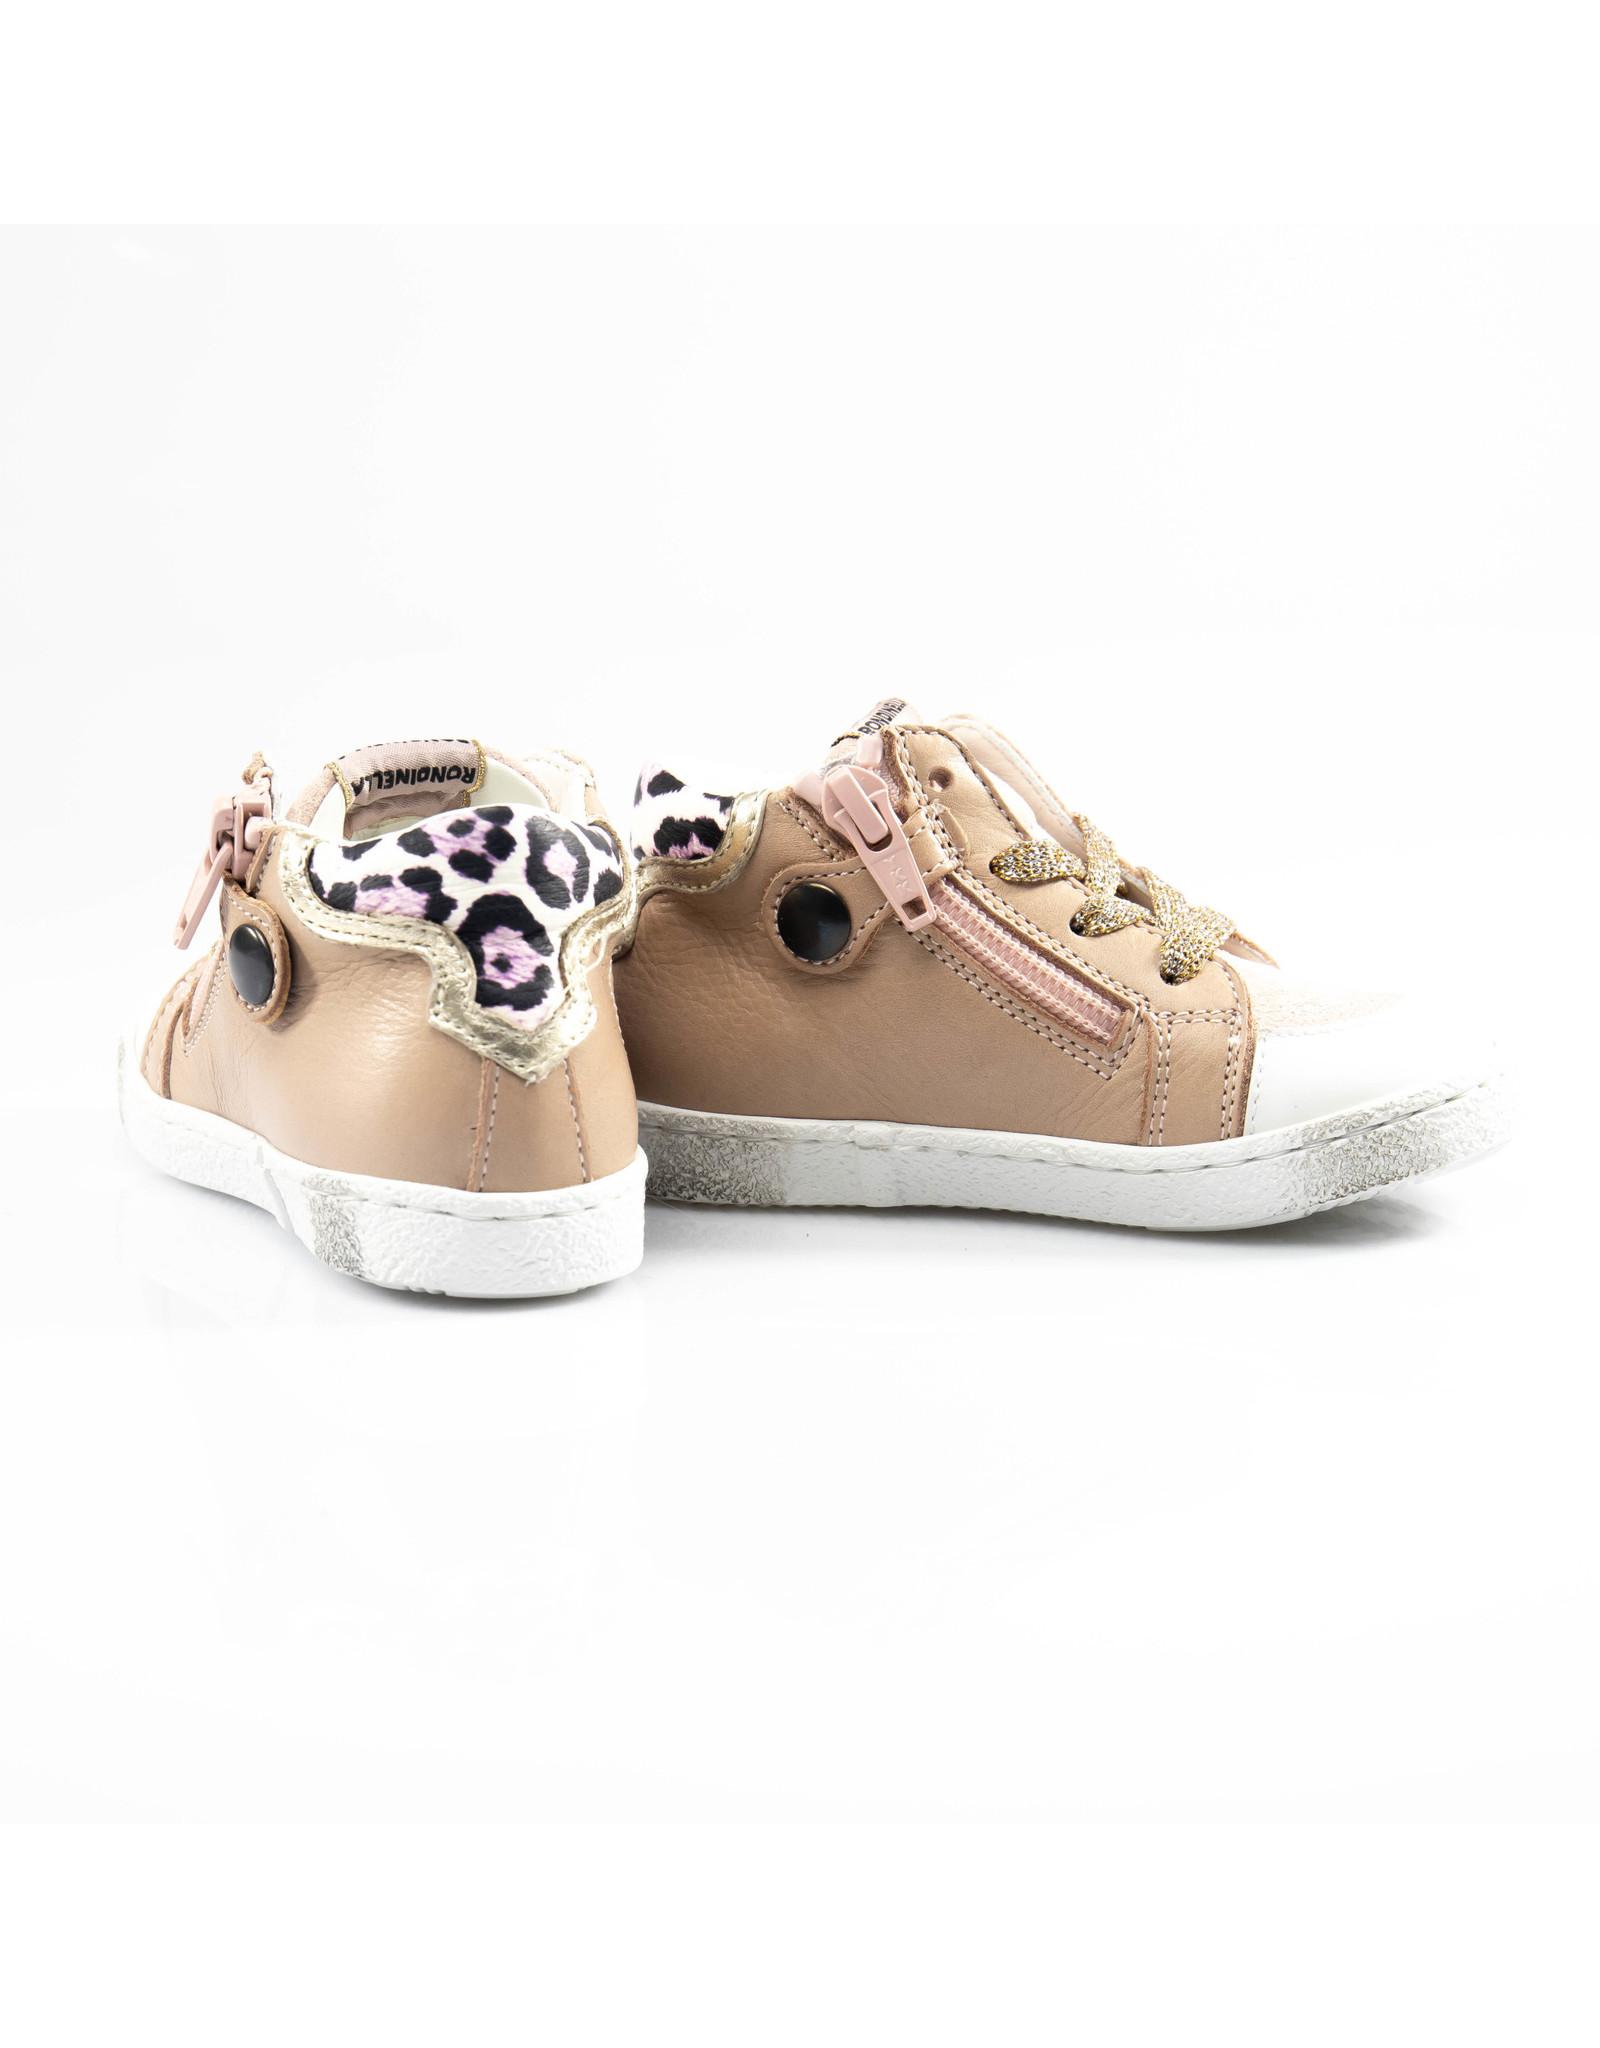 Rondinella hoge sneaker oud roze, paarse ster